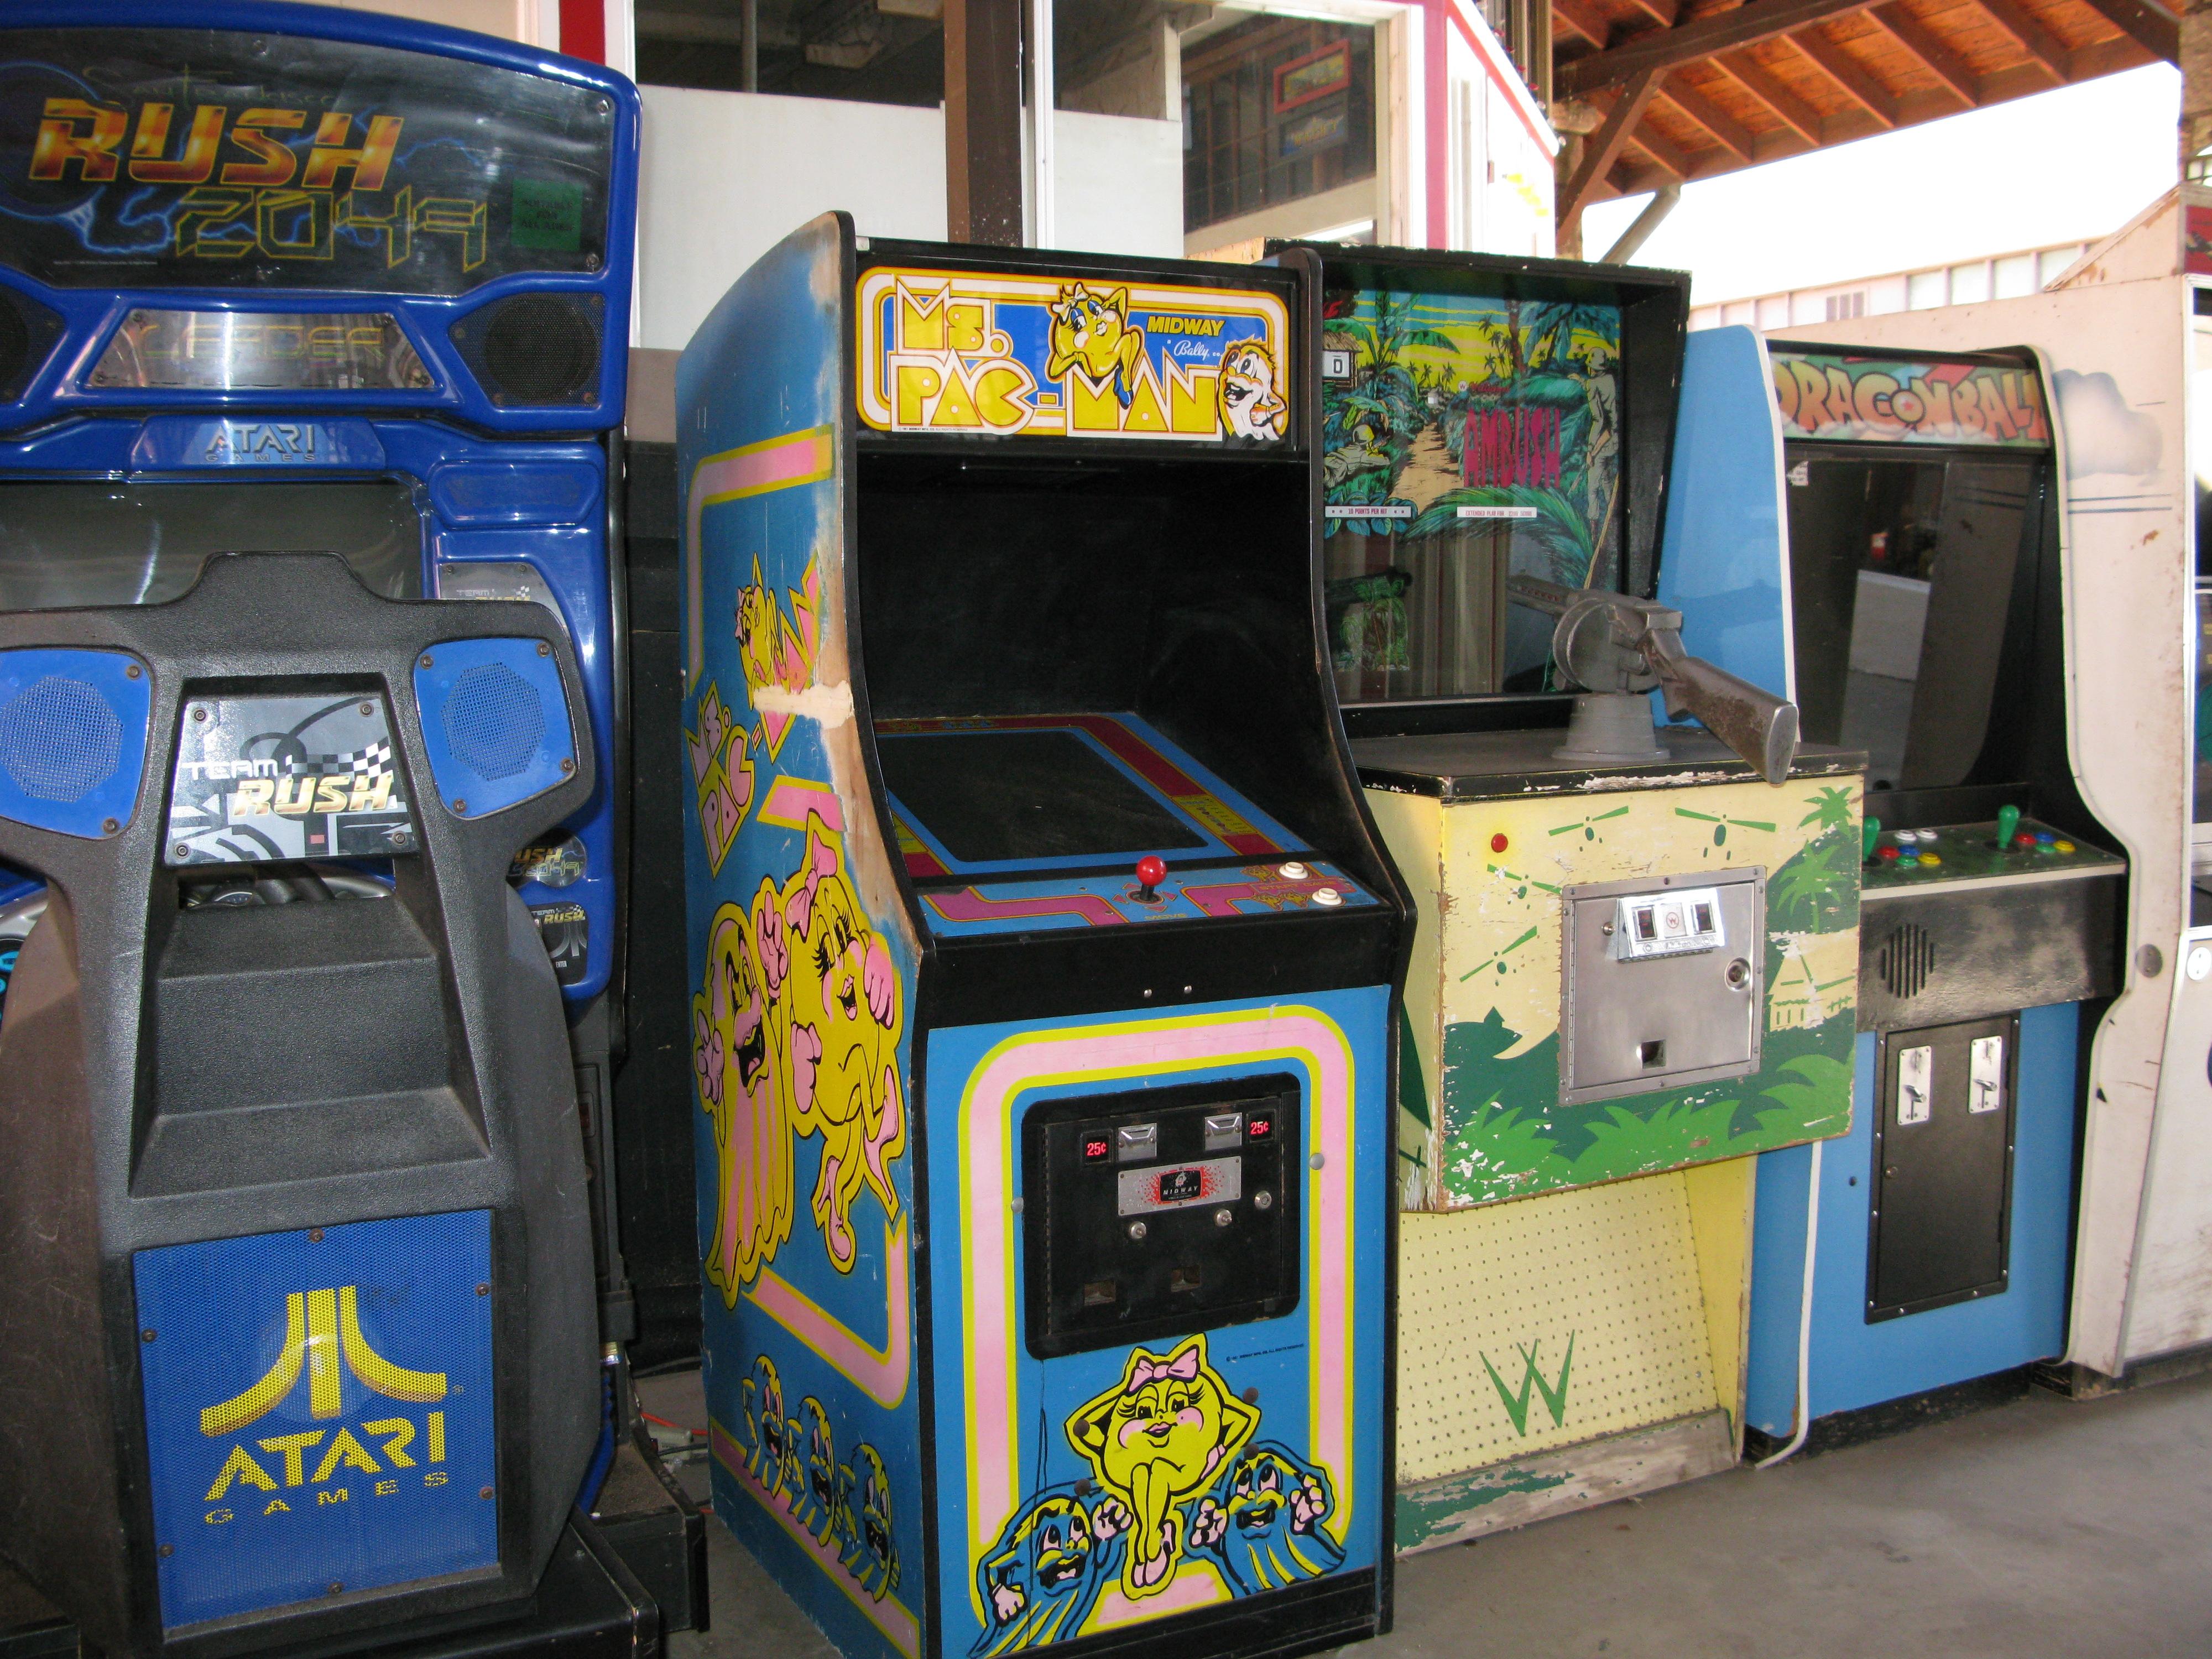 Ms Pacman Cabinet Filesan Francisco Rush 2049 Ms Pacman Ambush Gun Dragonballjpg